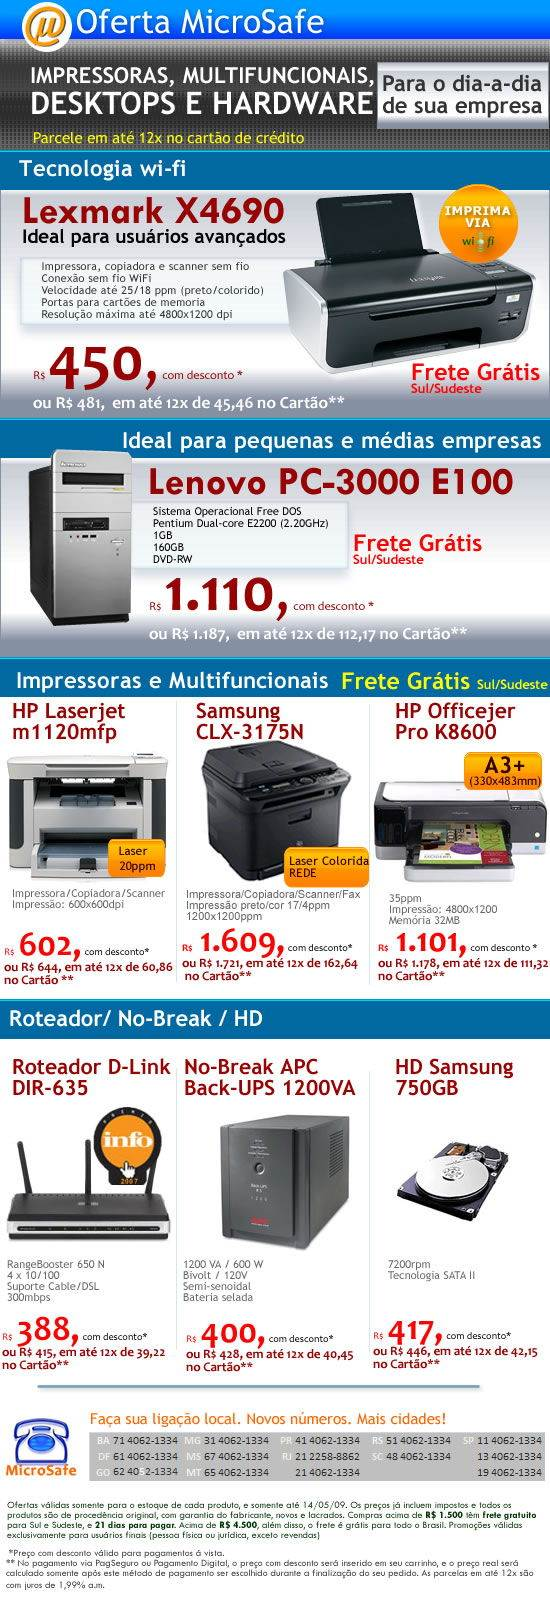 Impressora_Lexmark_wi-fi_apenas_R$450,